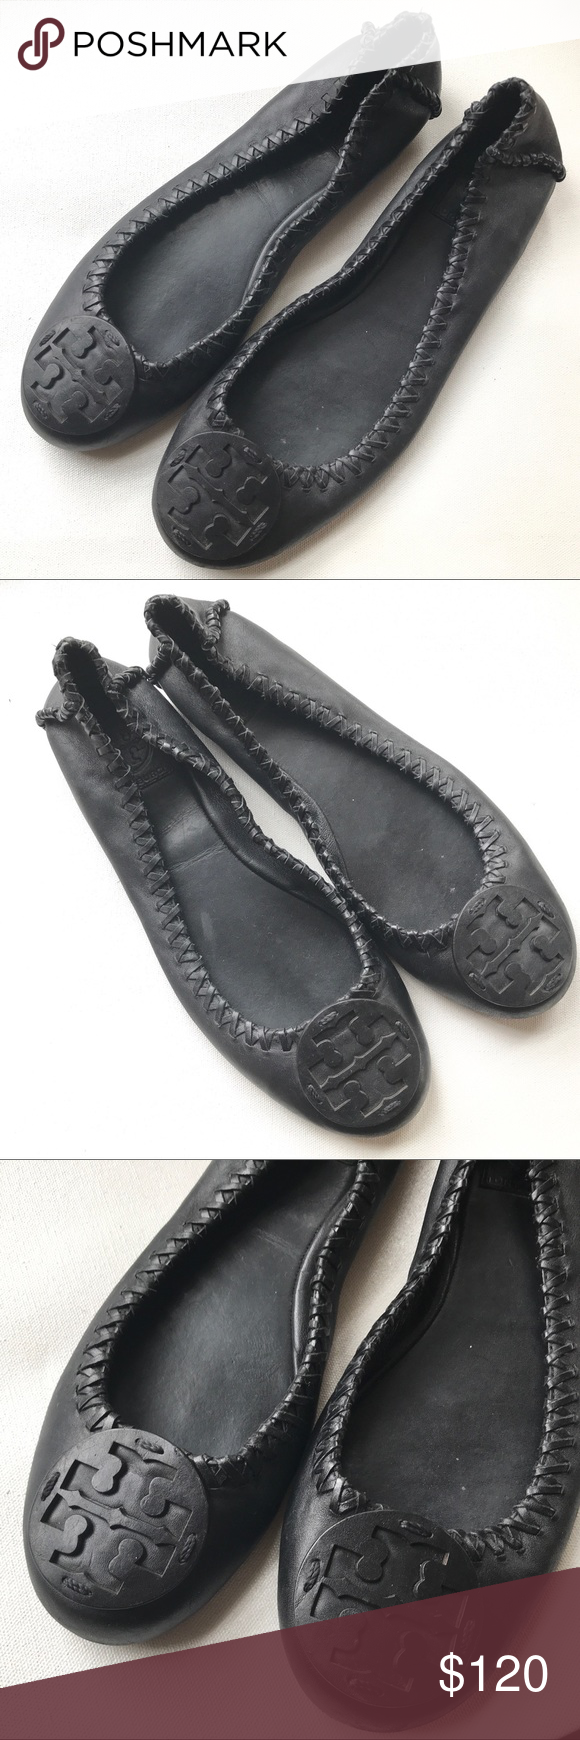 6662ed0d54f6c ... discount code for tory burch reva flats shoes 10 m black preowned black  tory burch flats